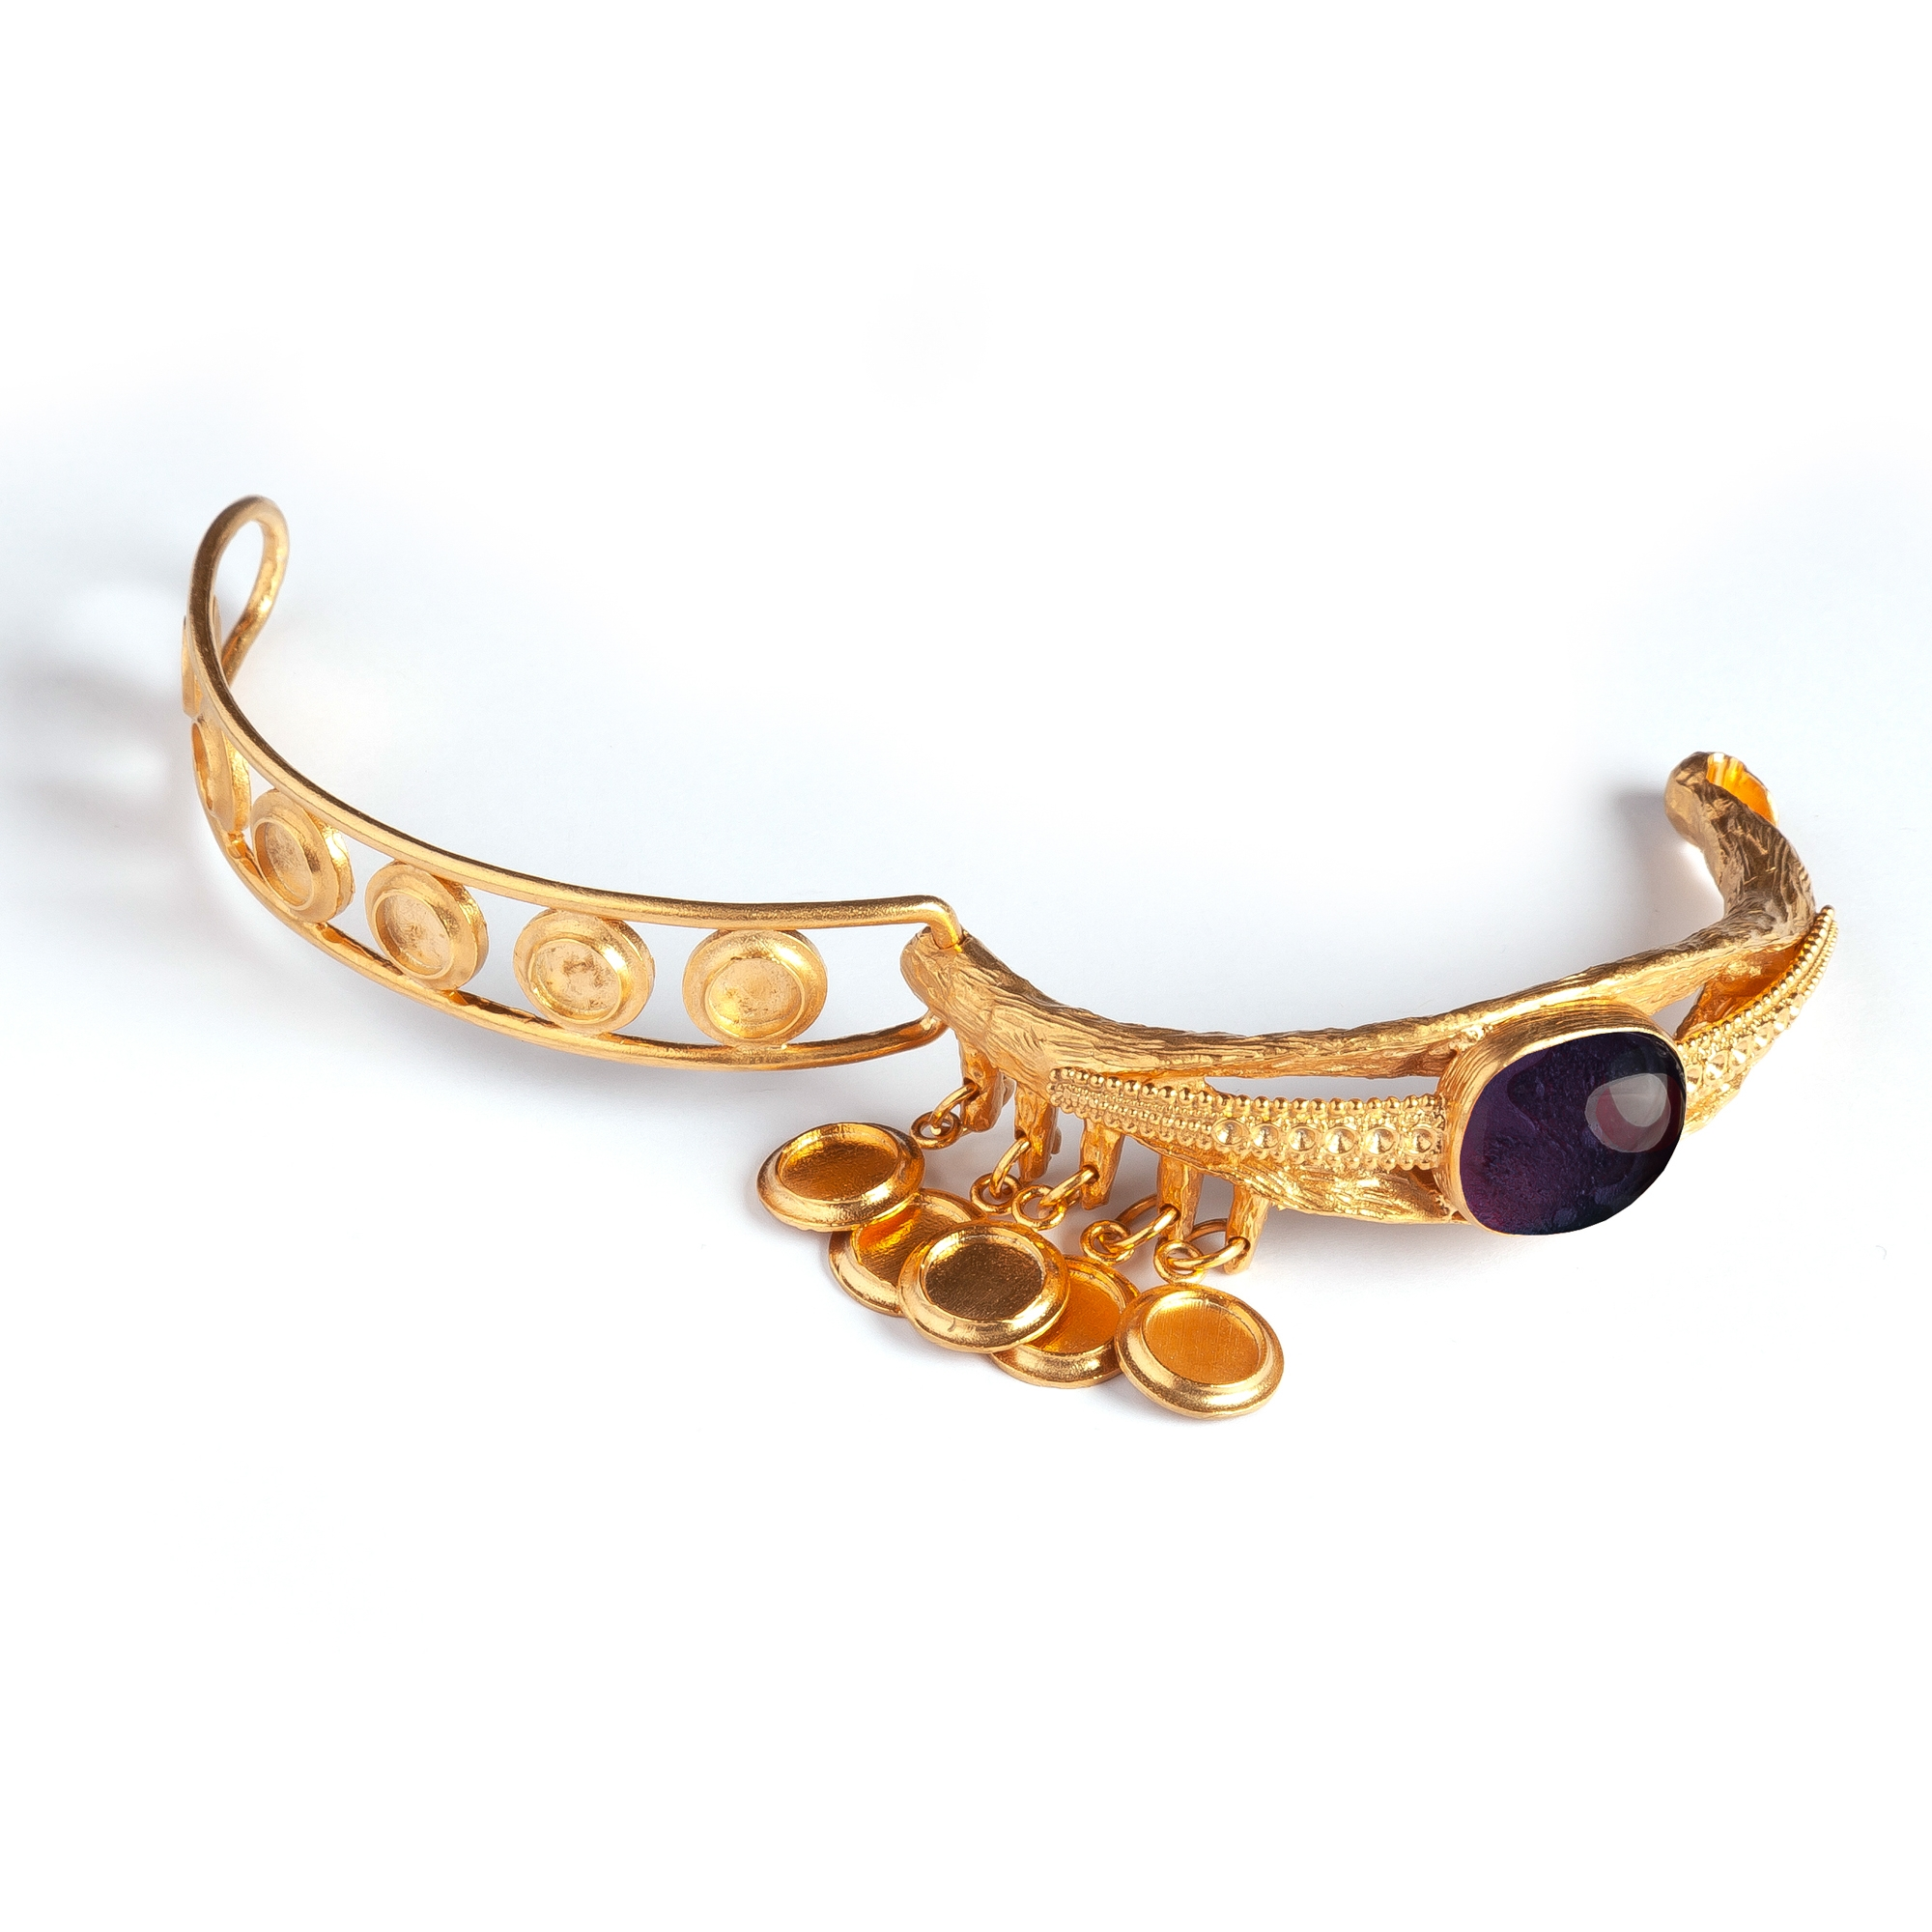 Onyx Eye Luxury Bracelet by Sonia Petroff on curated-crowd.com